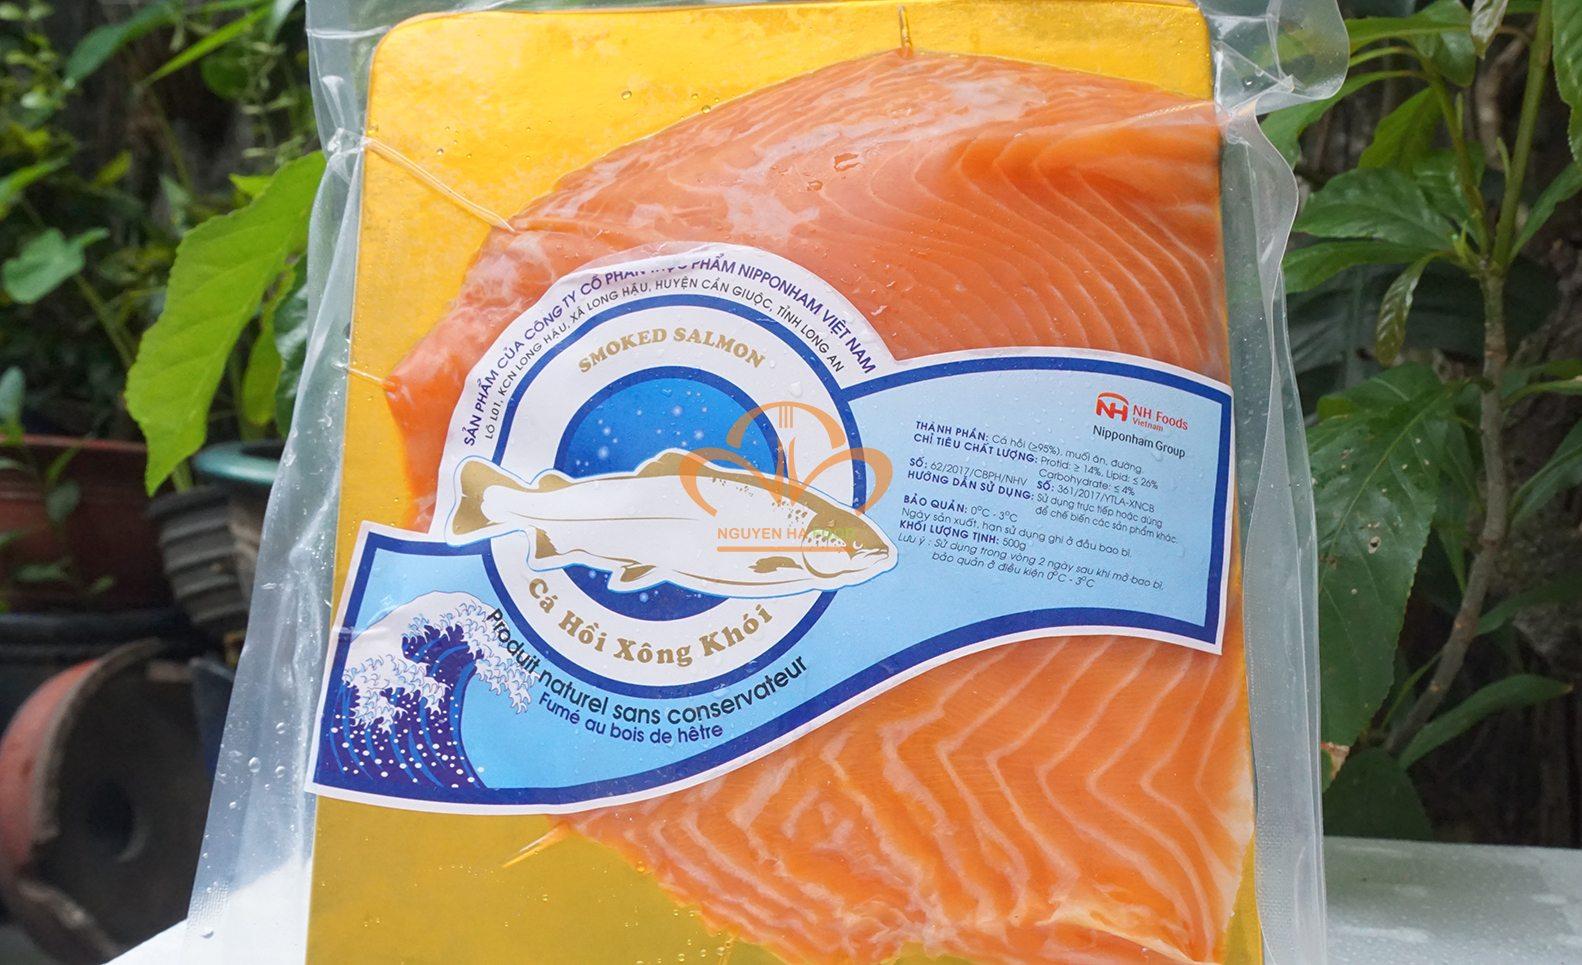 thit-ca-hoi-xong-khoi-co-nguyen-mieng-da-smoked-salmon-skin-on-2